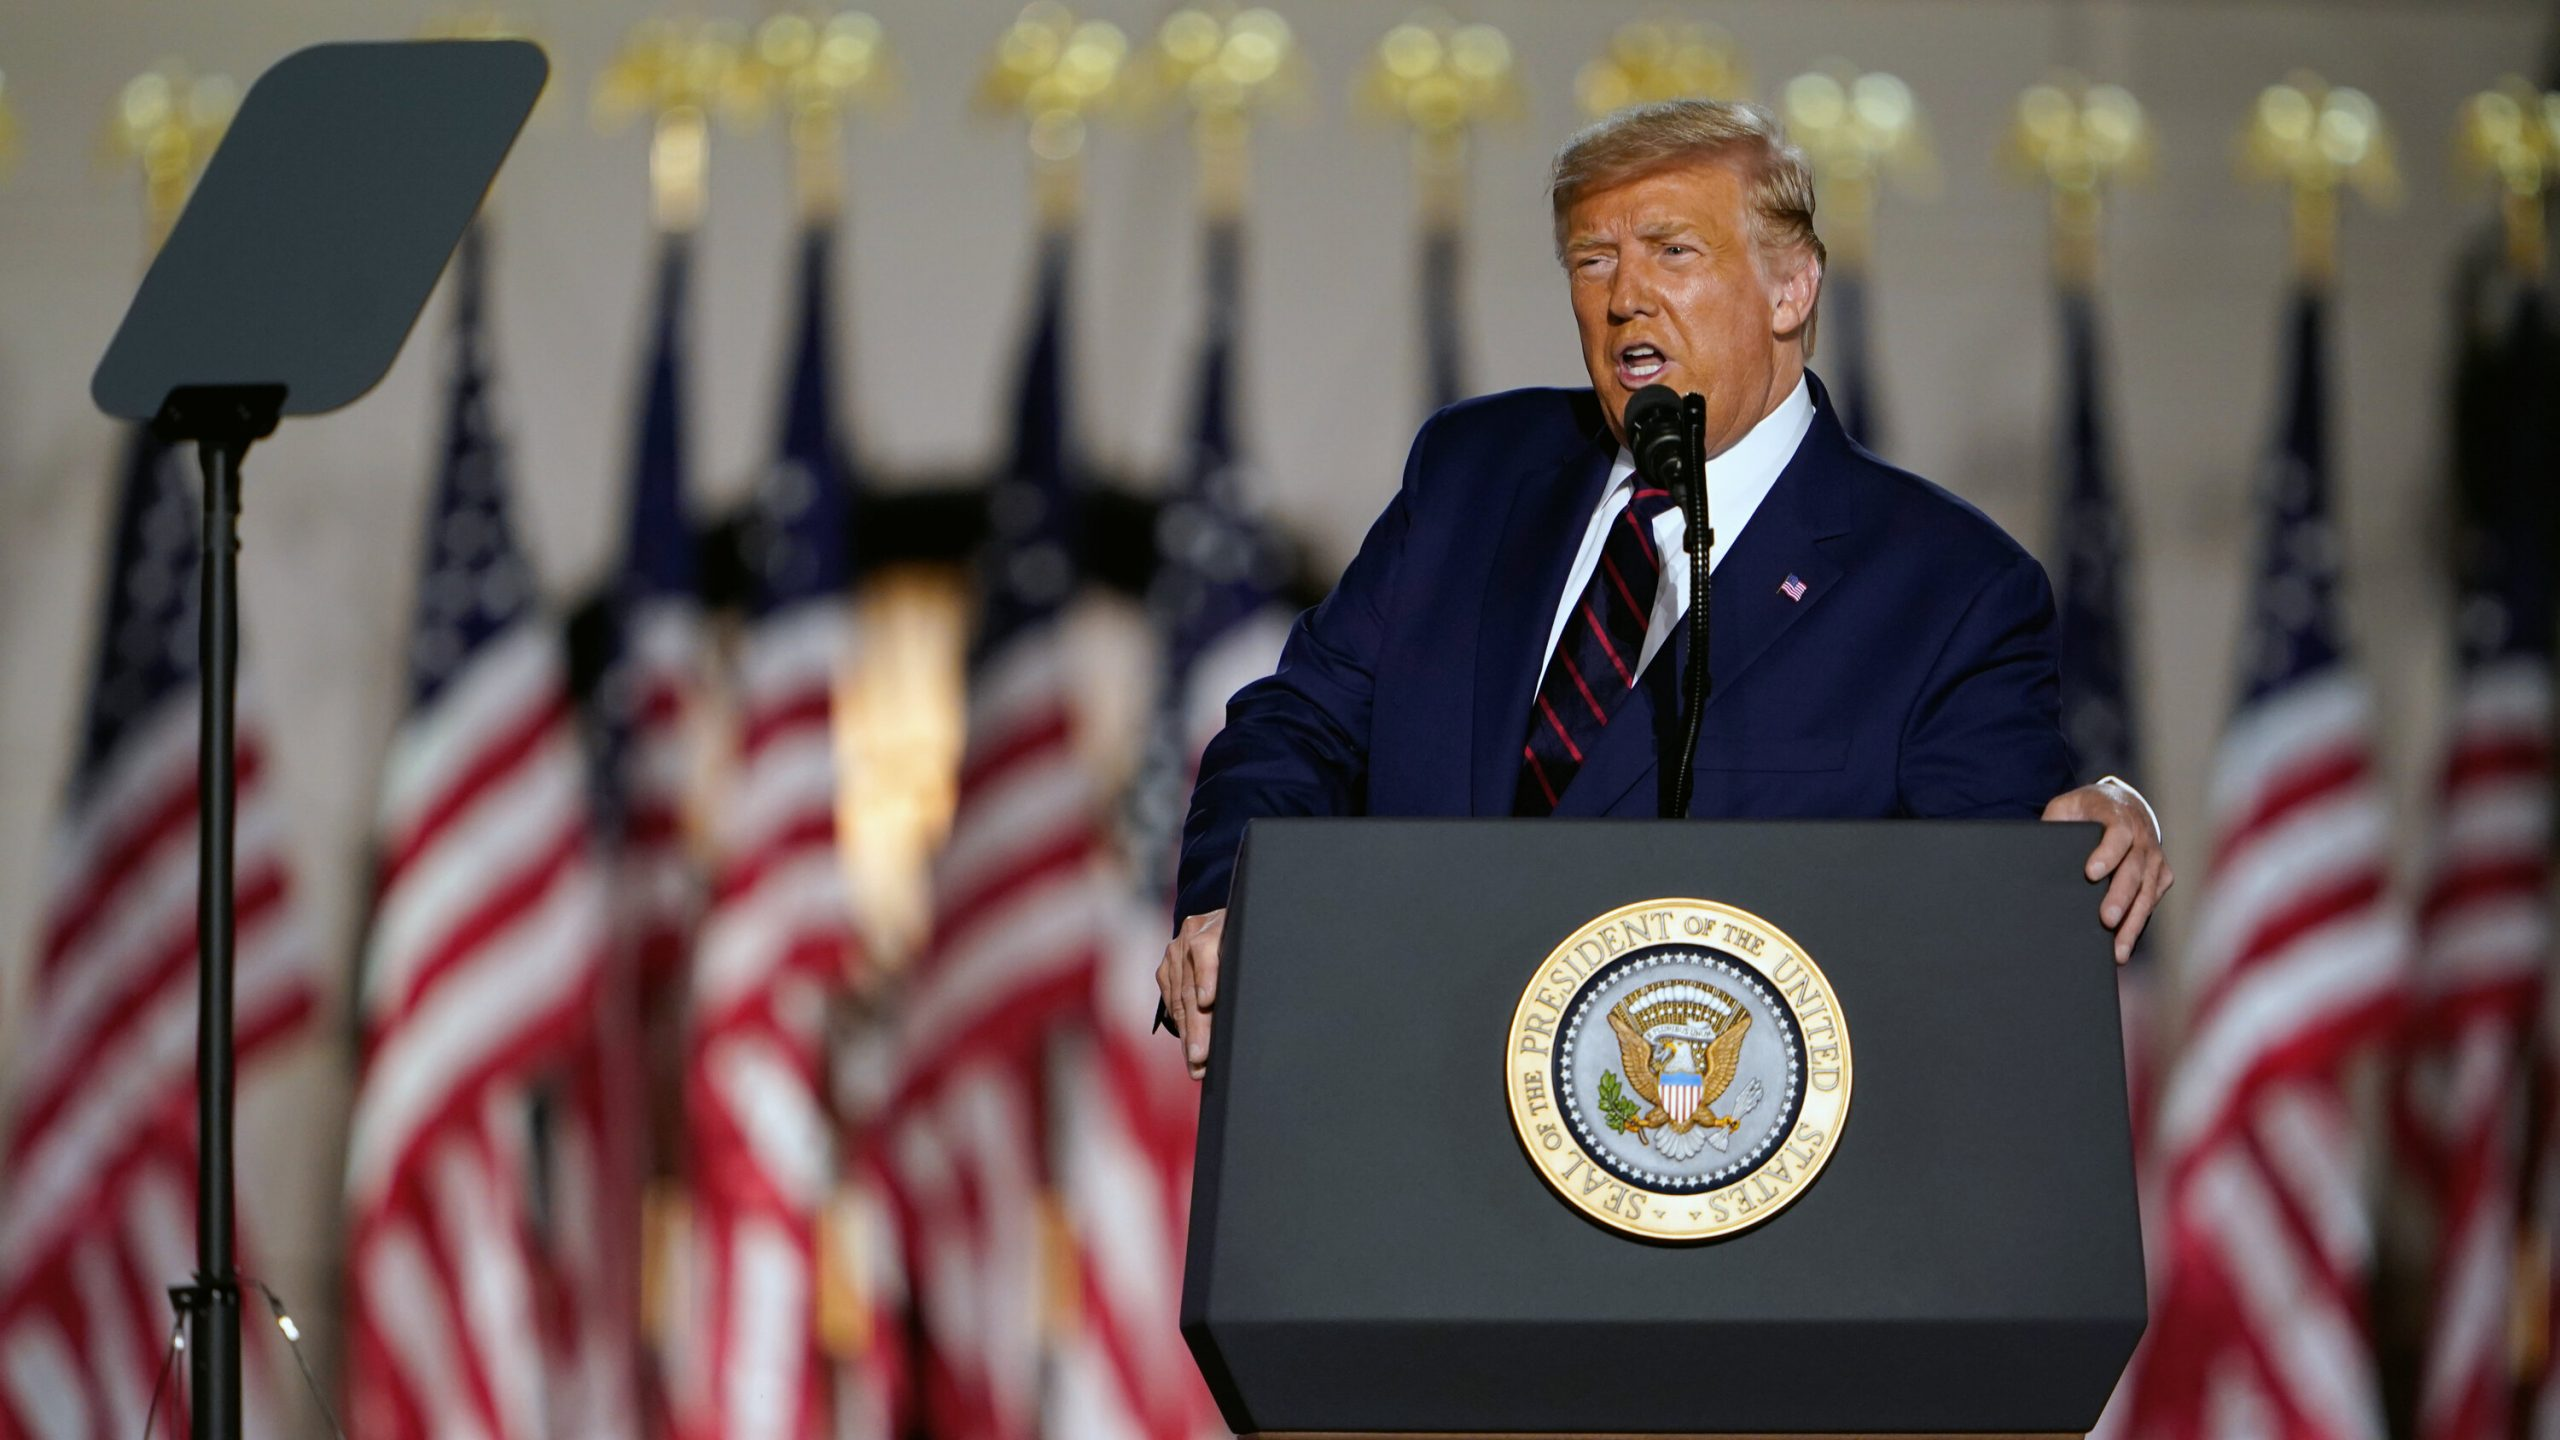 Donald Trump em Convenção Nacional Republicana. FOTO: Doug Mills / NYT